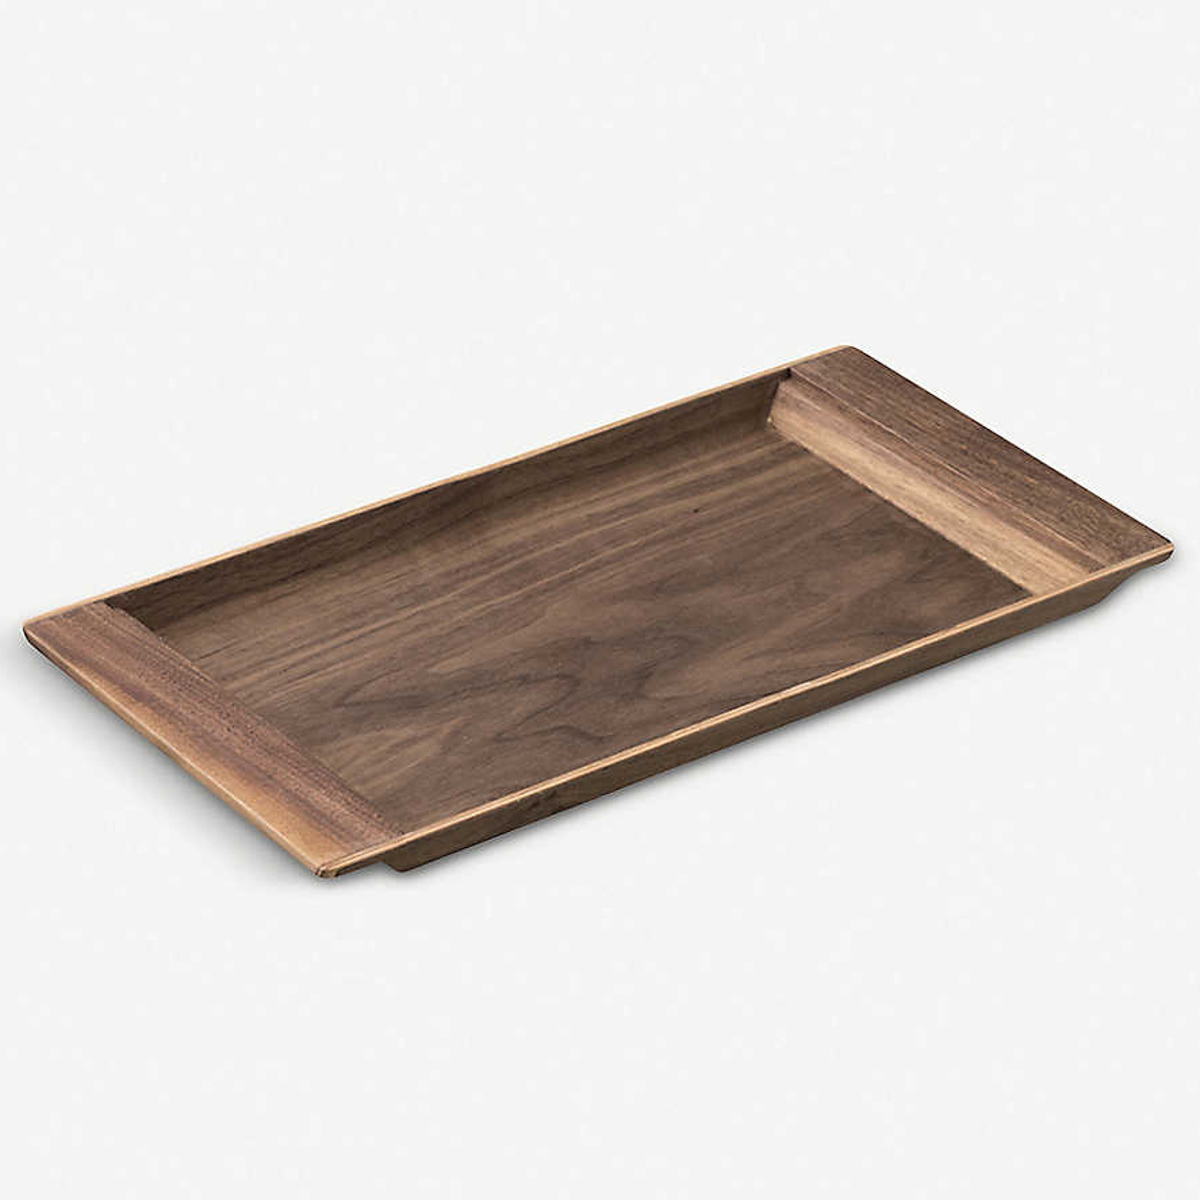 kinto-selfridges-wooden-tray-storage-lifestyle-man-for-himself